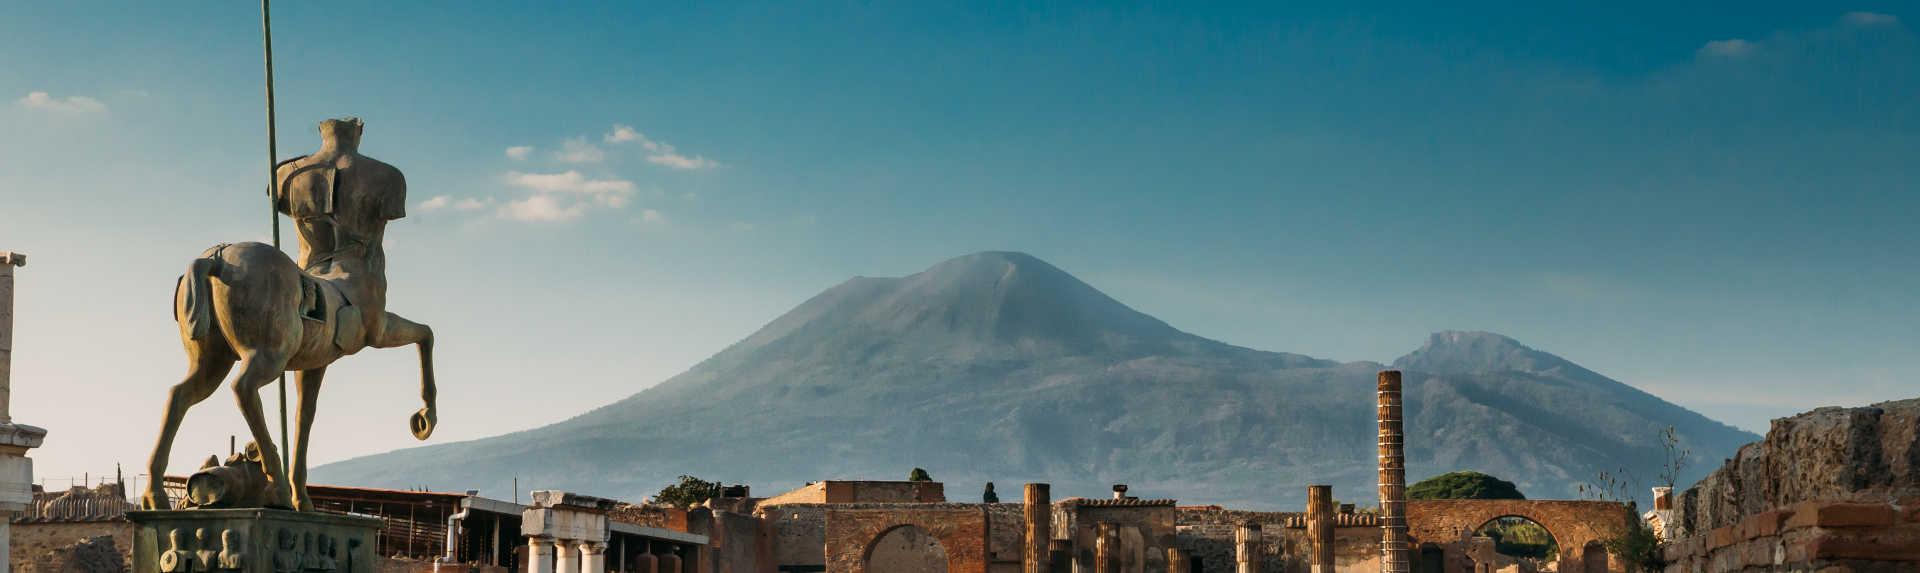 Is Pompeii worth visiting?